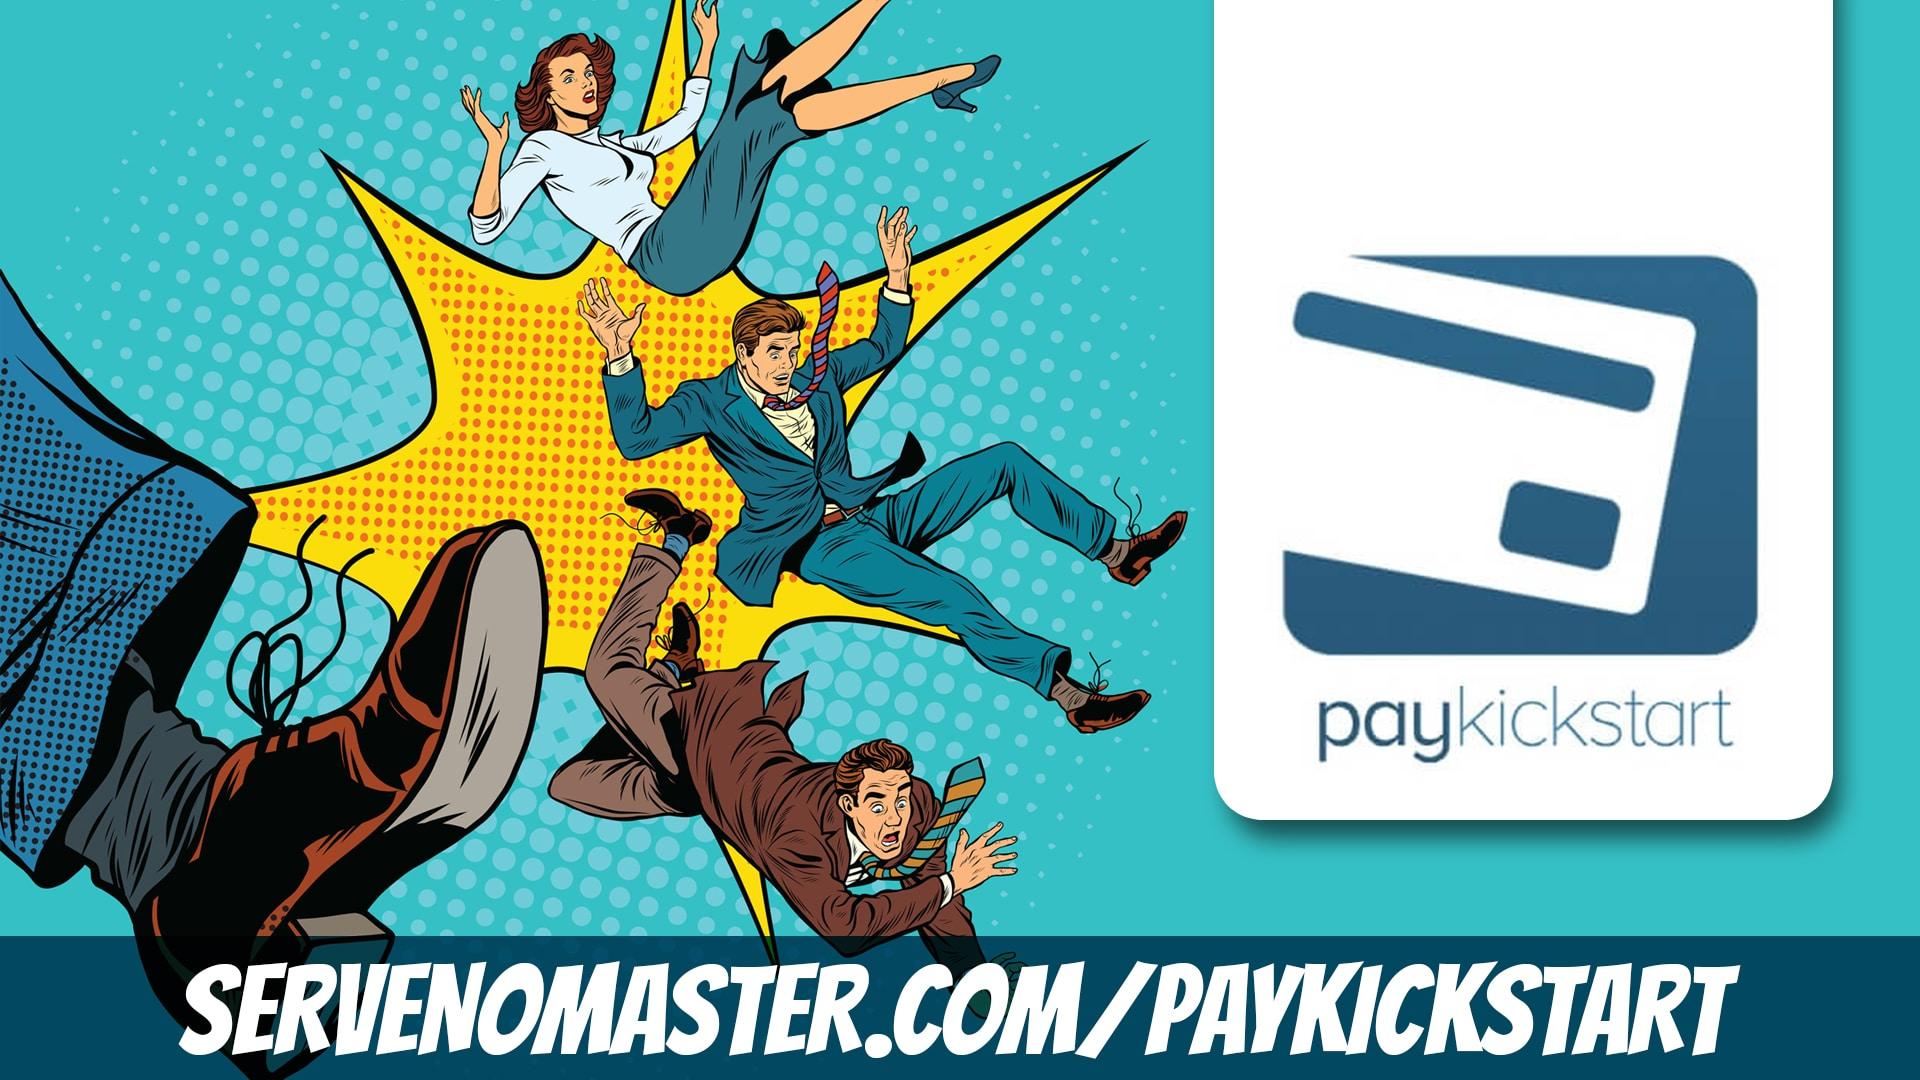 paykickstart checkout cart illustration